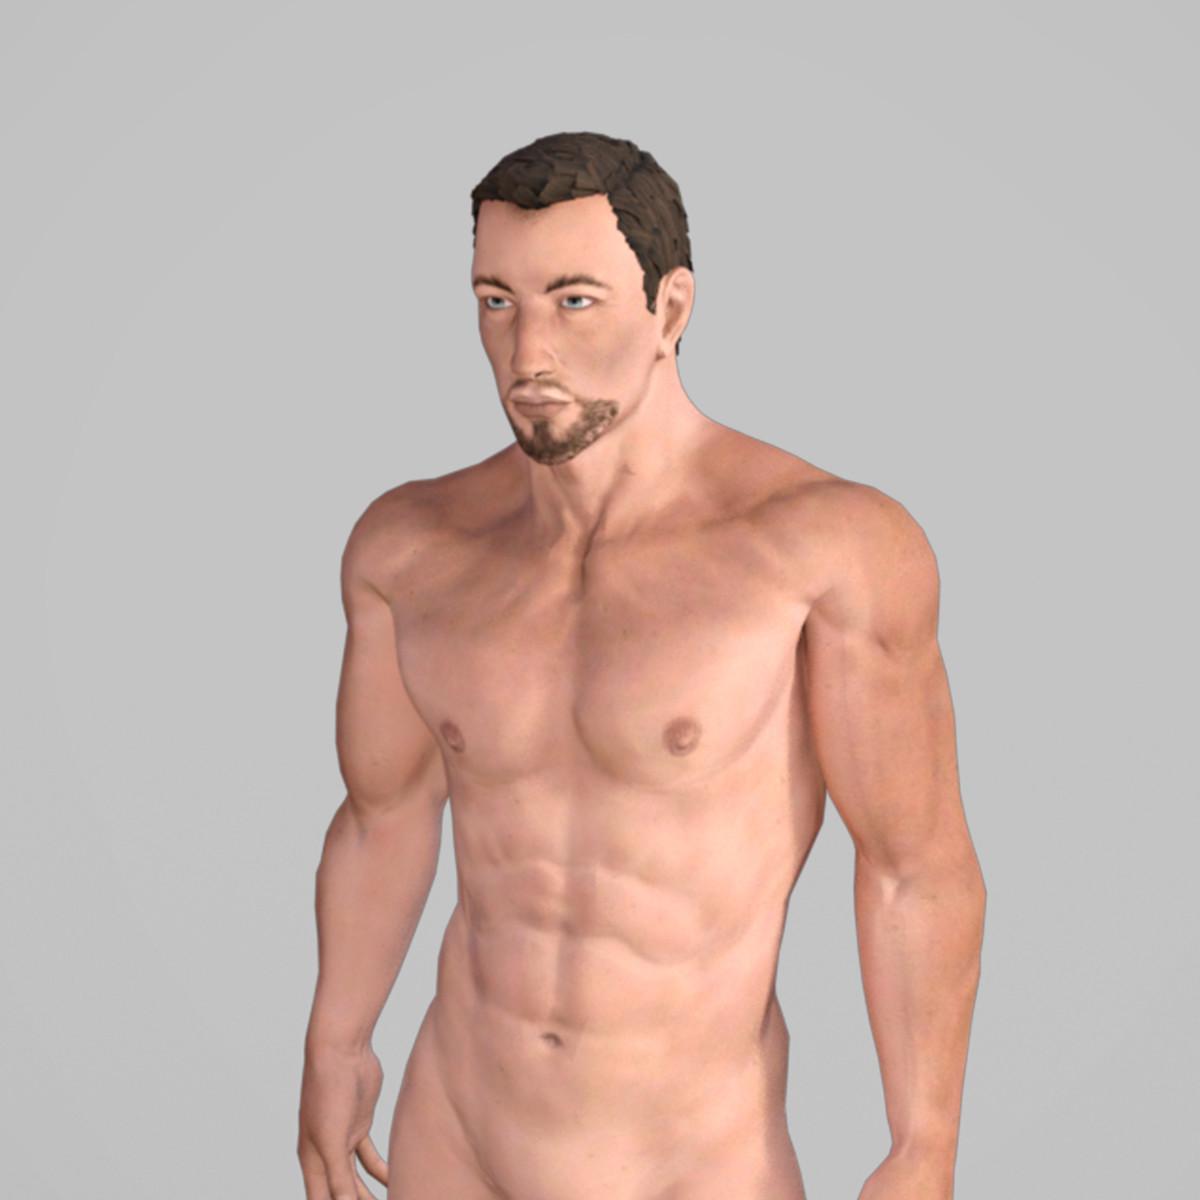 Naked boys animated Sex Anime